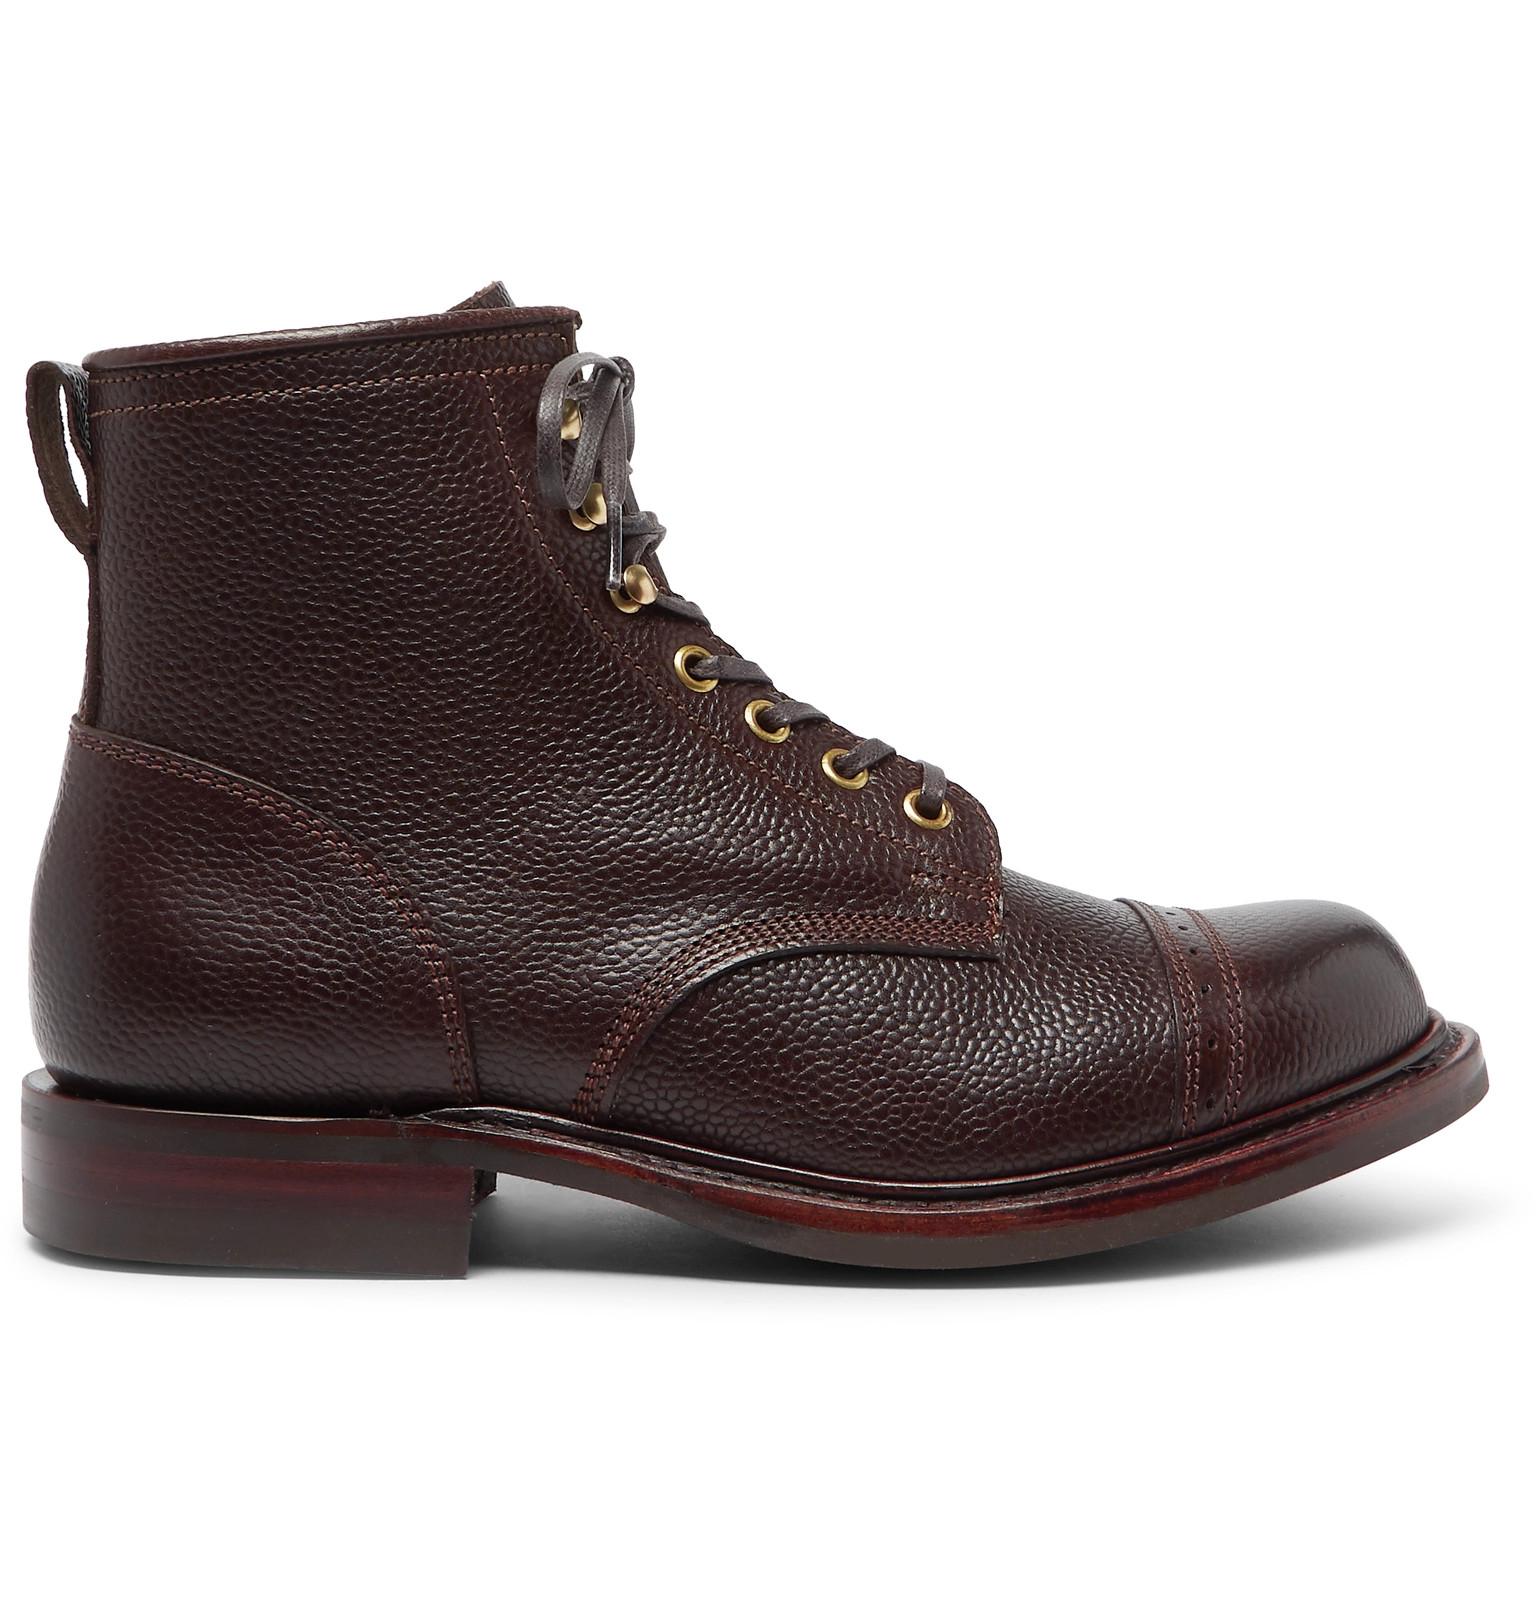 0aa9bbf48c7 RRL - Bowery Pebble-Grain Leather Boots